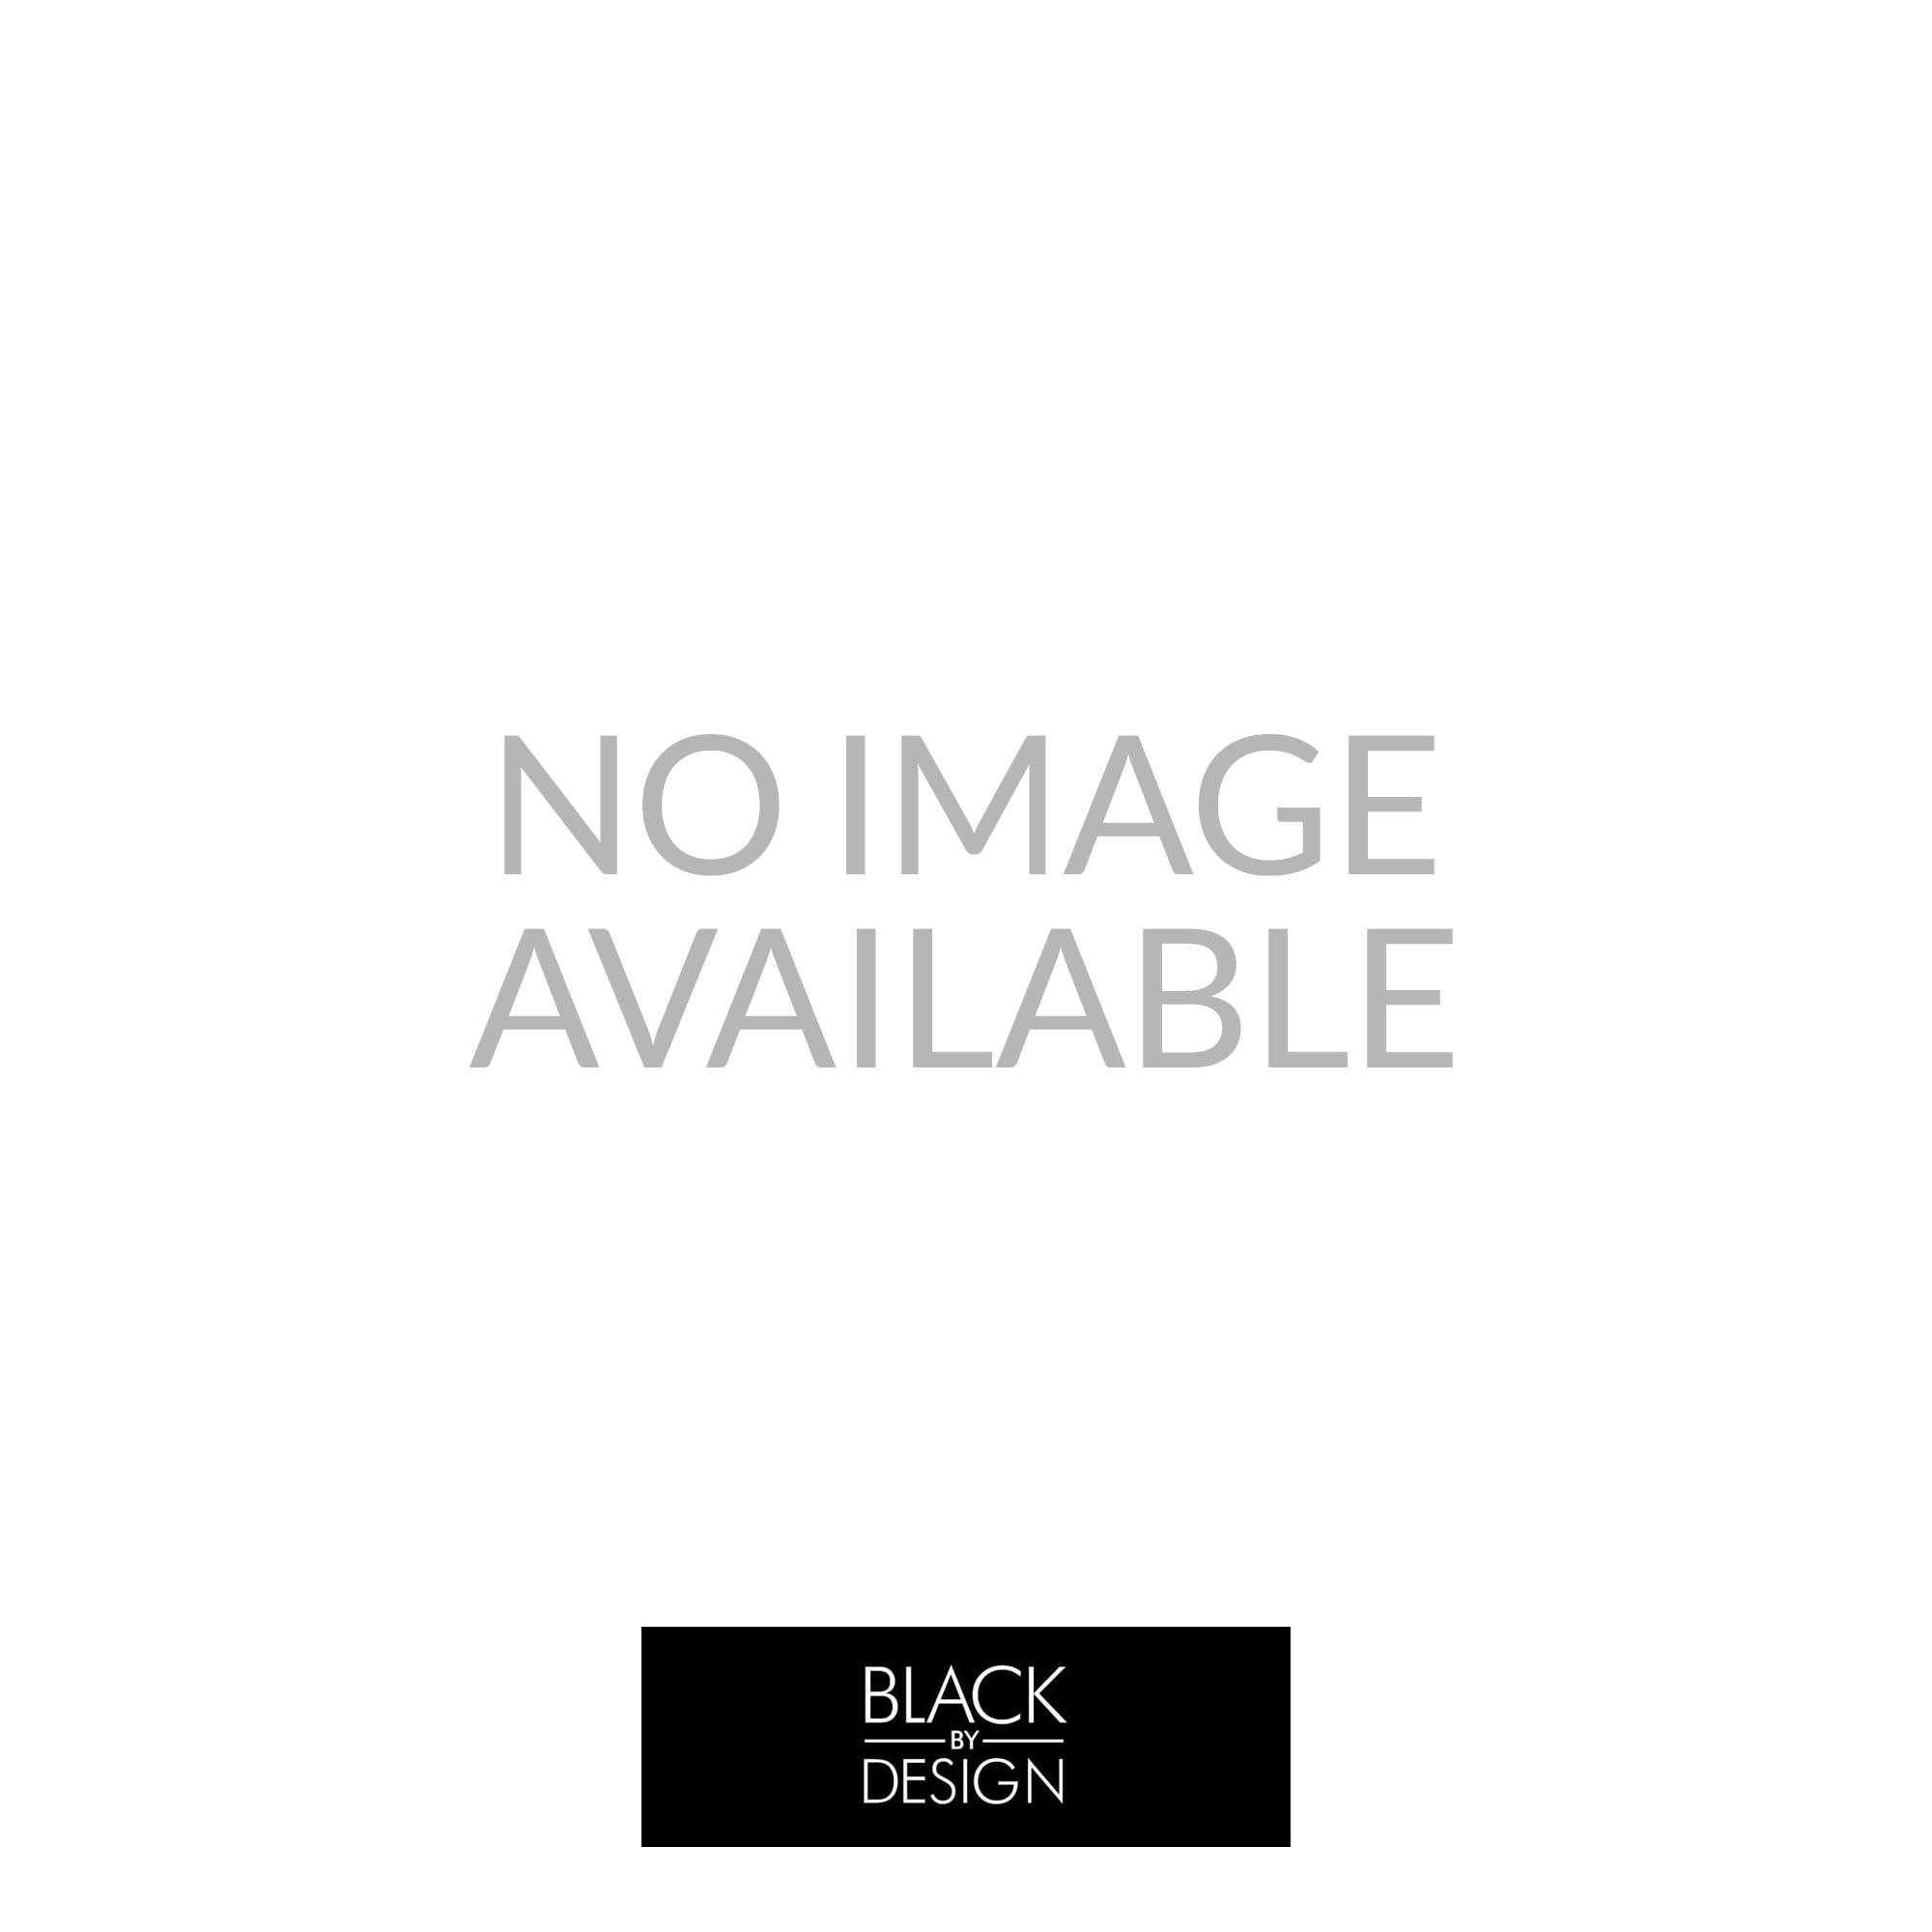 normann copenhagen norm 69 pendant light shade from black. Black Bedroom Furniture Sets. Home Design Ideas